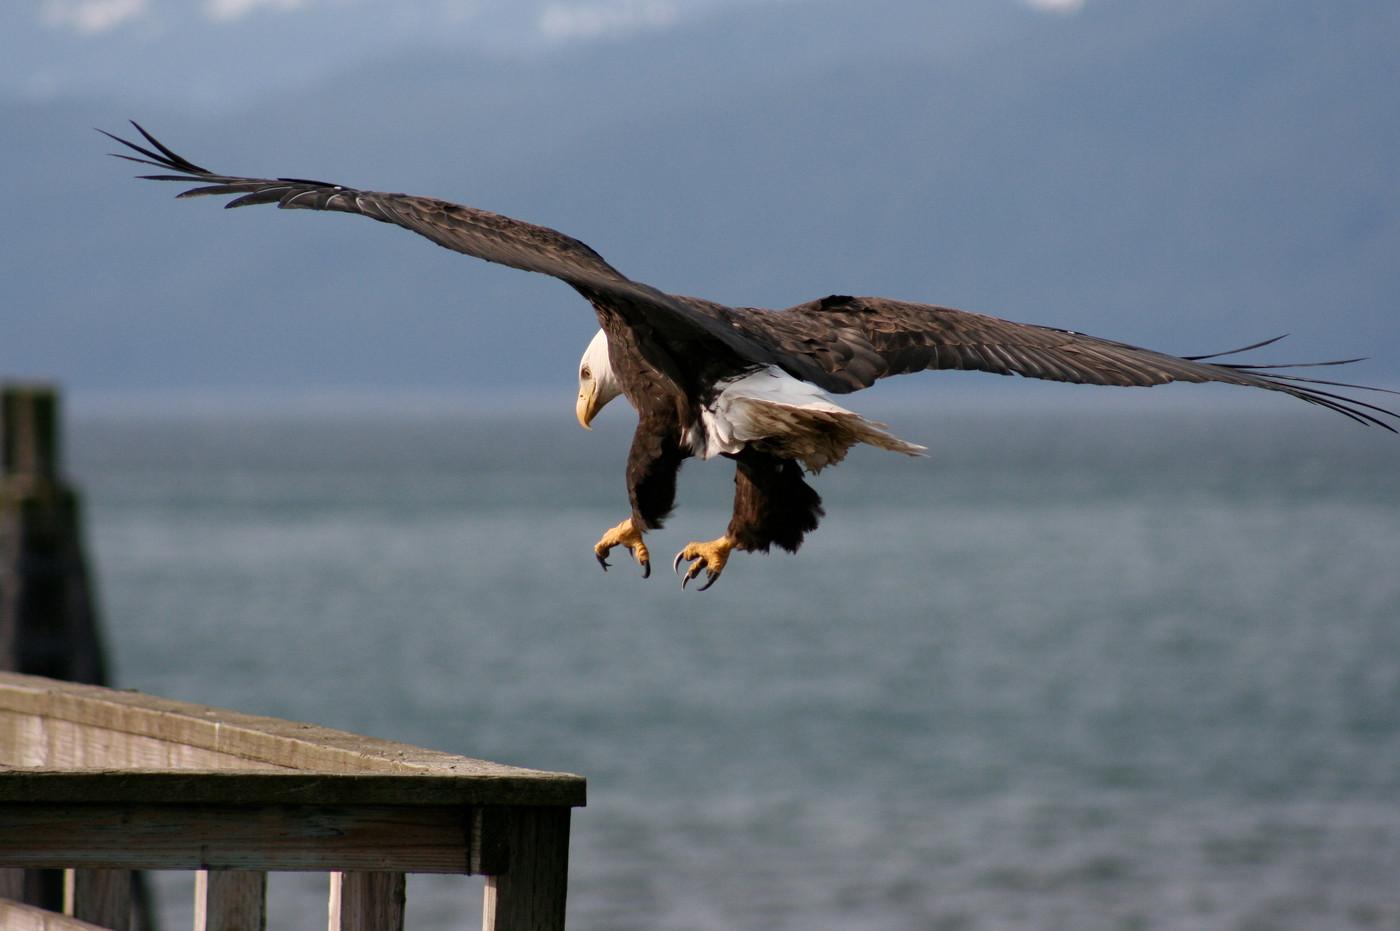 Eagle landing on approach to Gustavus dock